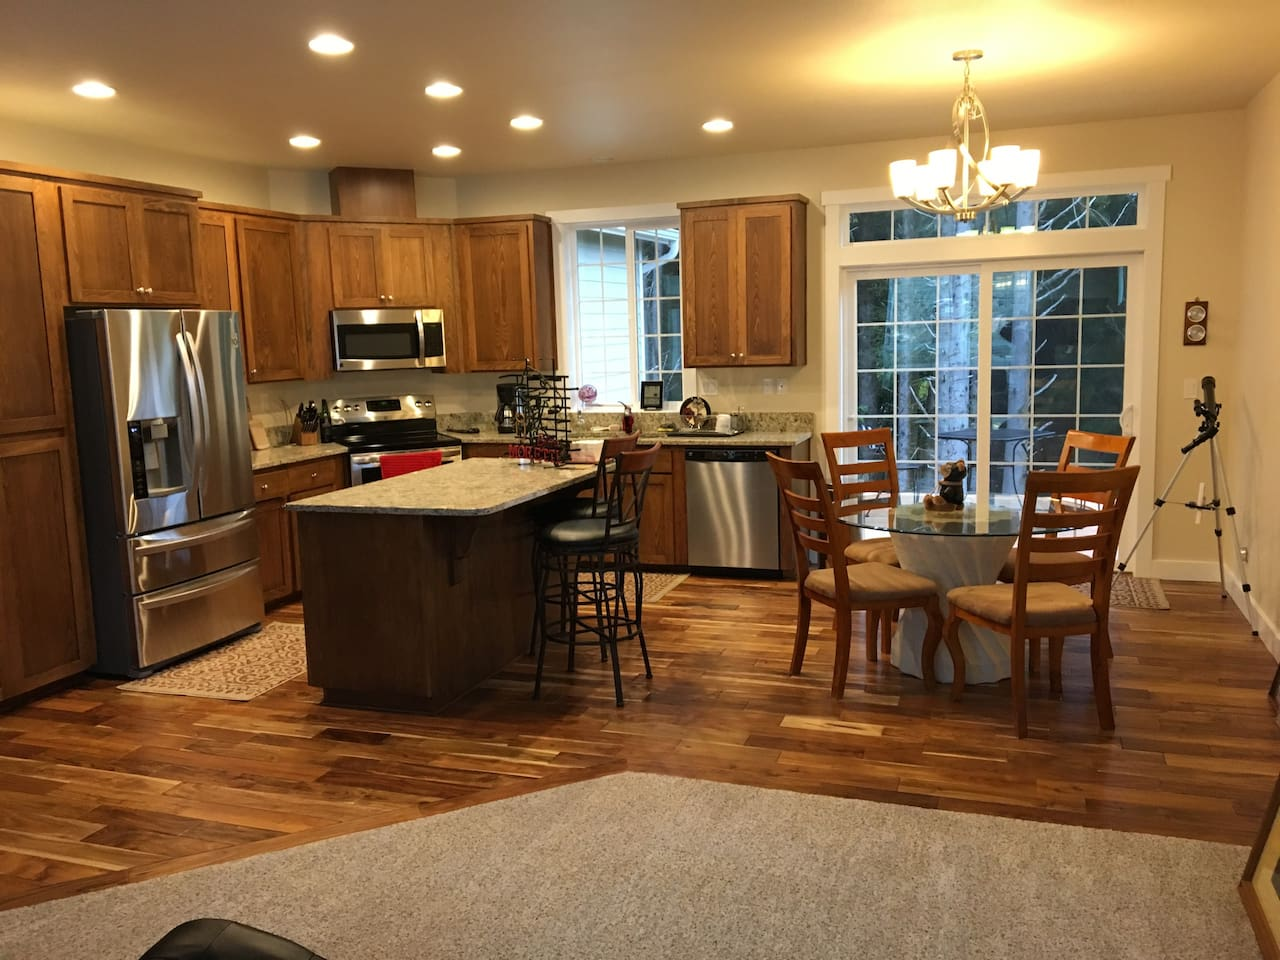 Kitchen, Dining, deck access